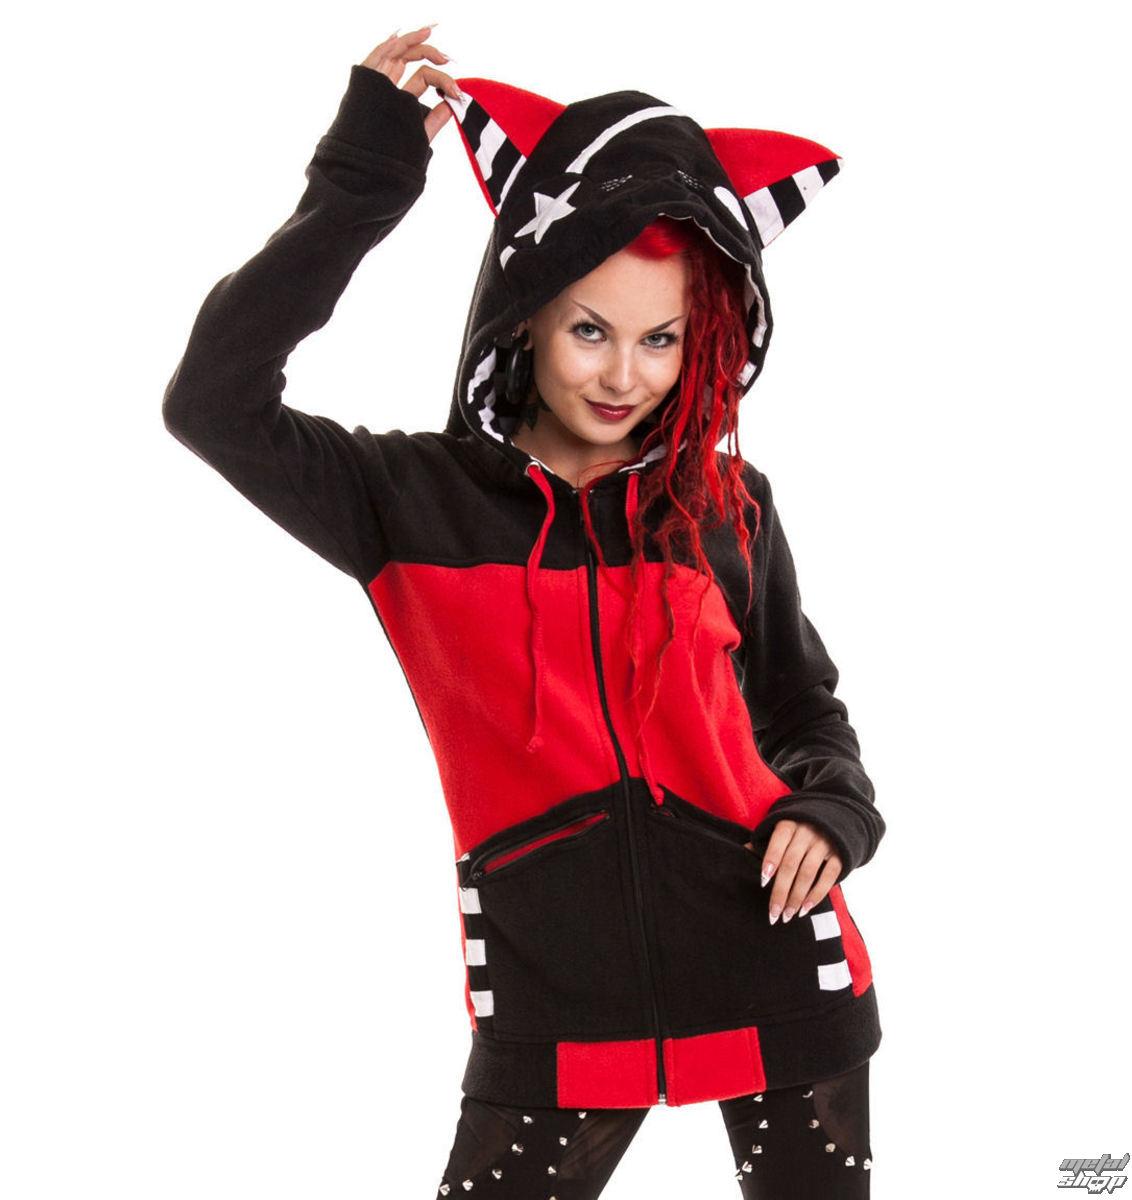 mikina dámská POIZEN INDUSTRIES - Star Kitty - Black/Red - POI107